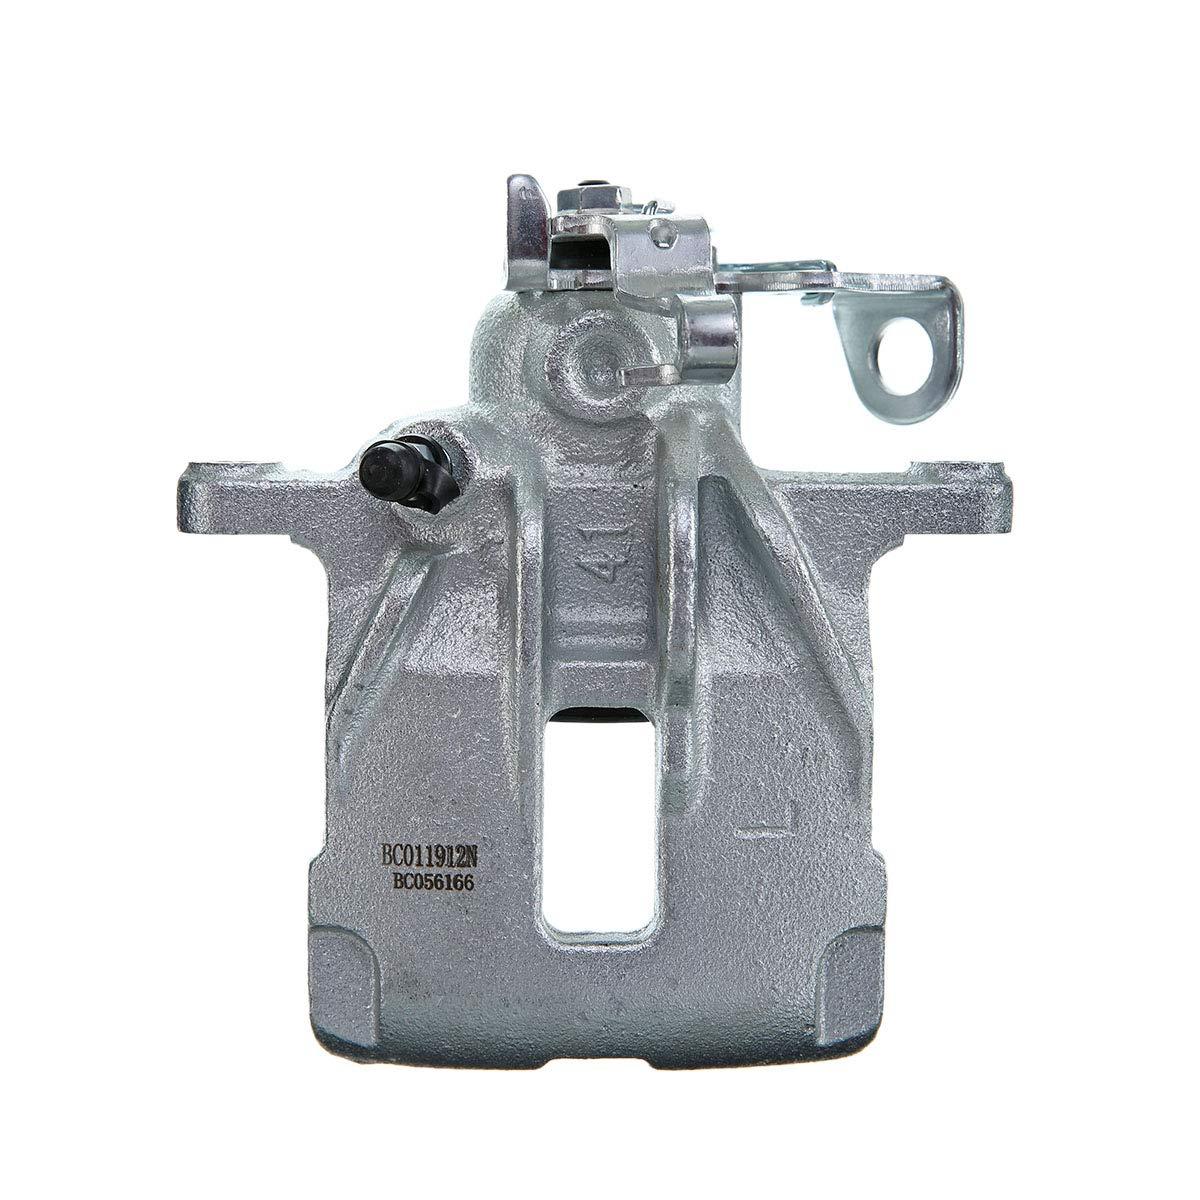 Professional 4pcs//Set Steel Broken Screws Extractor Broken Bolt Remover Easy Out Set Drill Bits Guide Set Jasnyfall Black